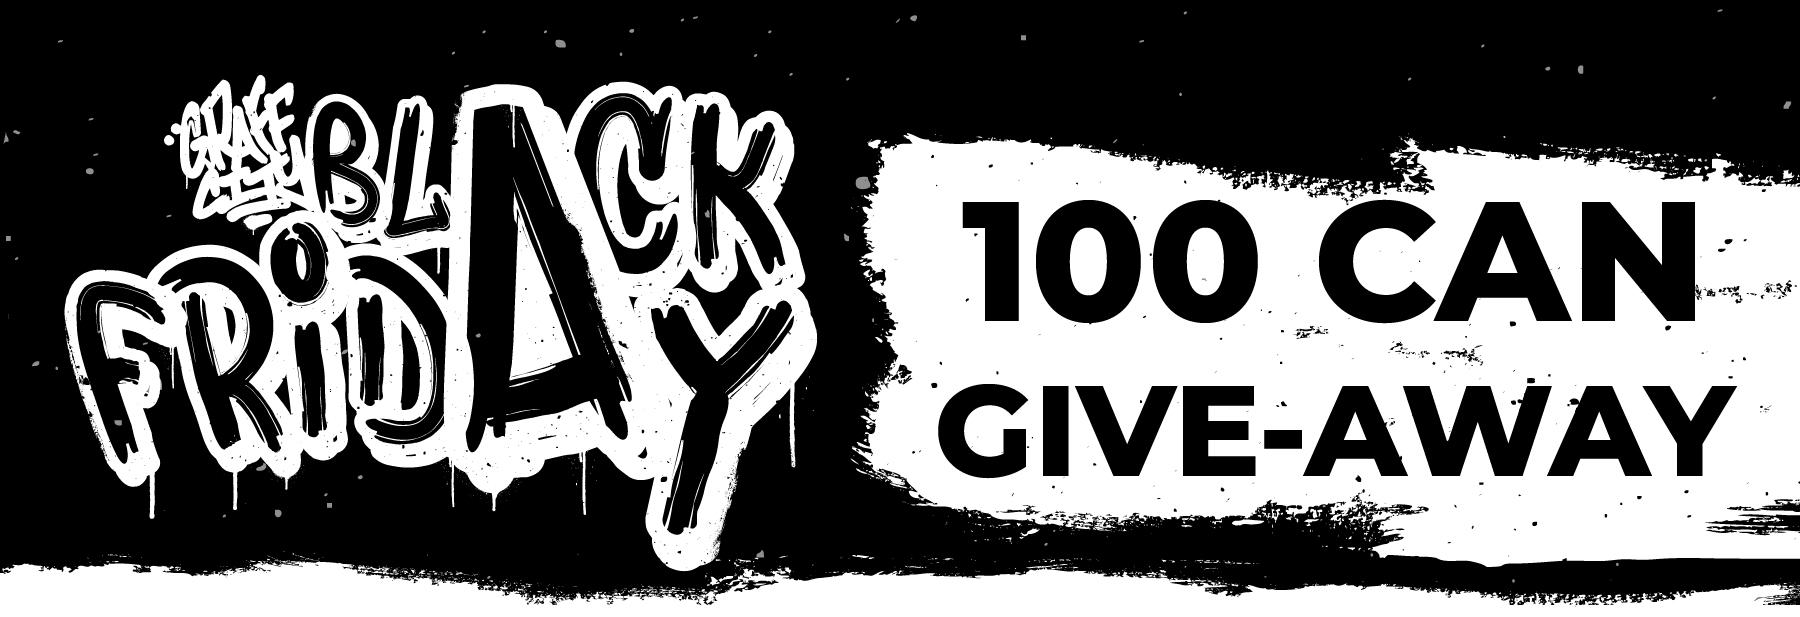 Black Friday 2019 Giveaway!